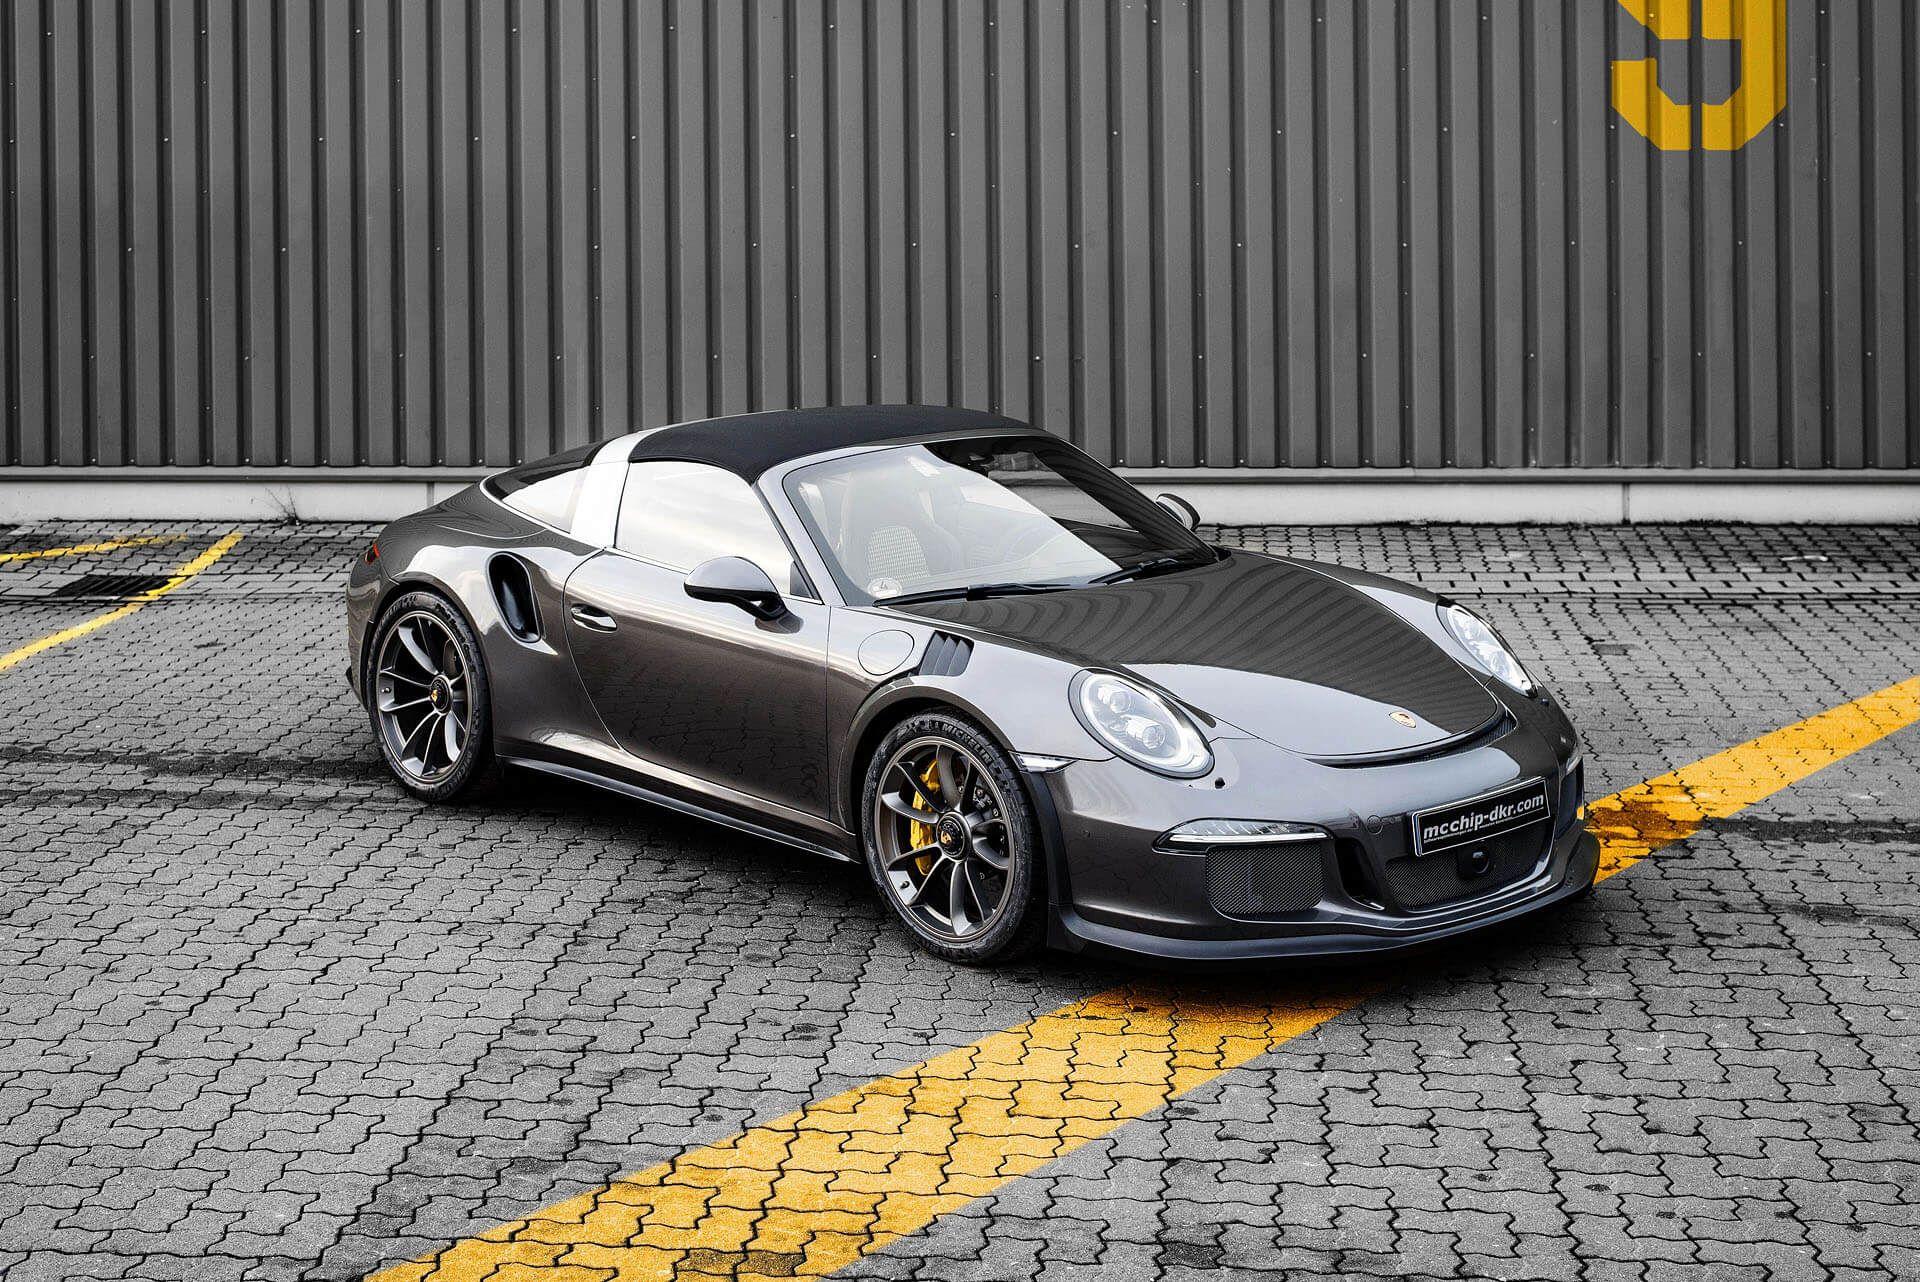 Porsche 991 Targa Gt3 Rs By Mcchip Dkr Is The Definition